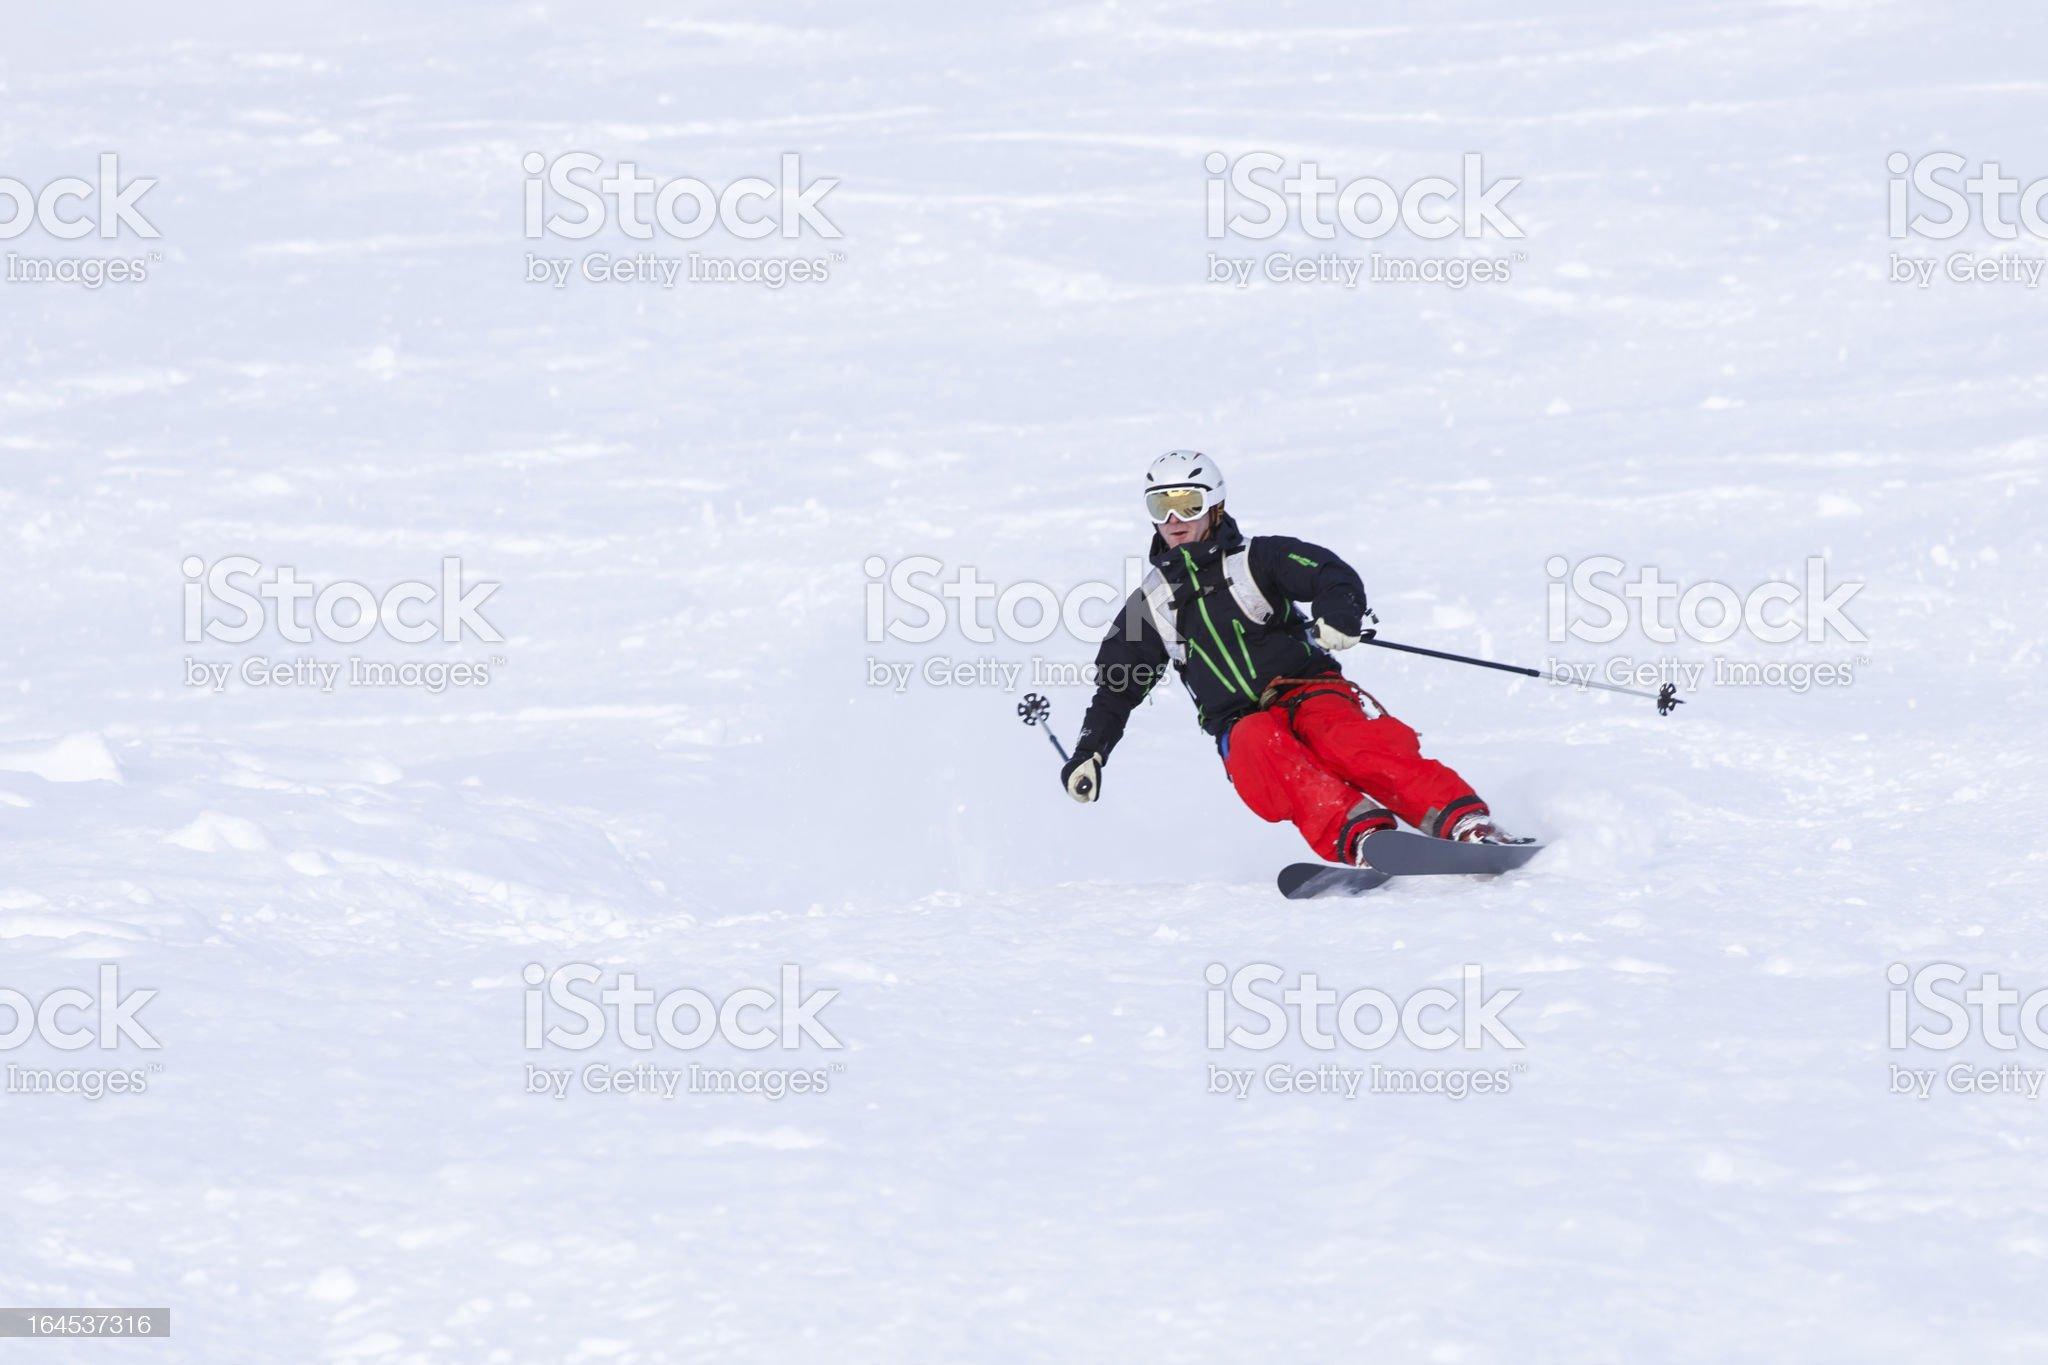 Skier turning in powder snow royalty-free stock photo